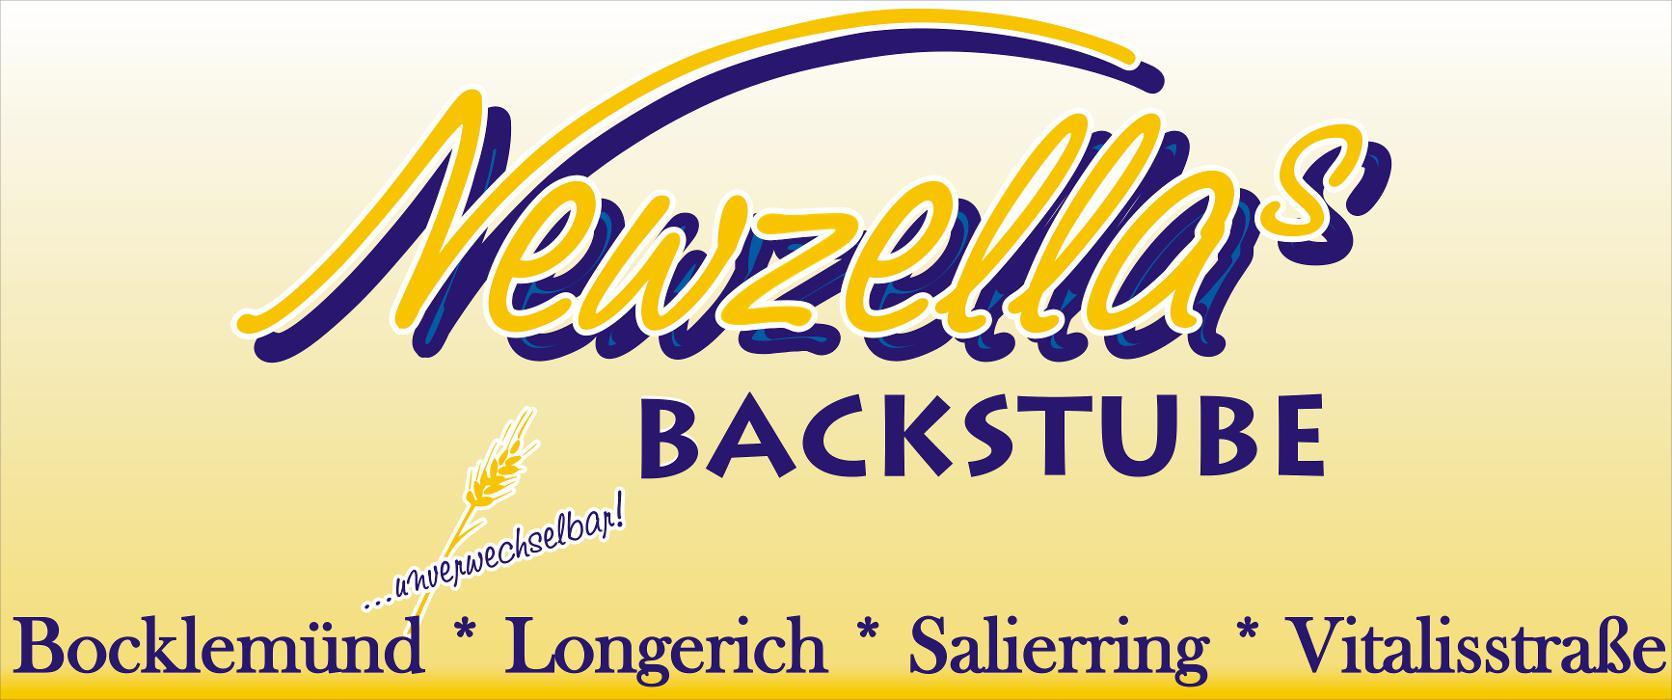 Logo von Bäckerei Newzellas Backstube Konditorei